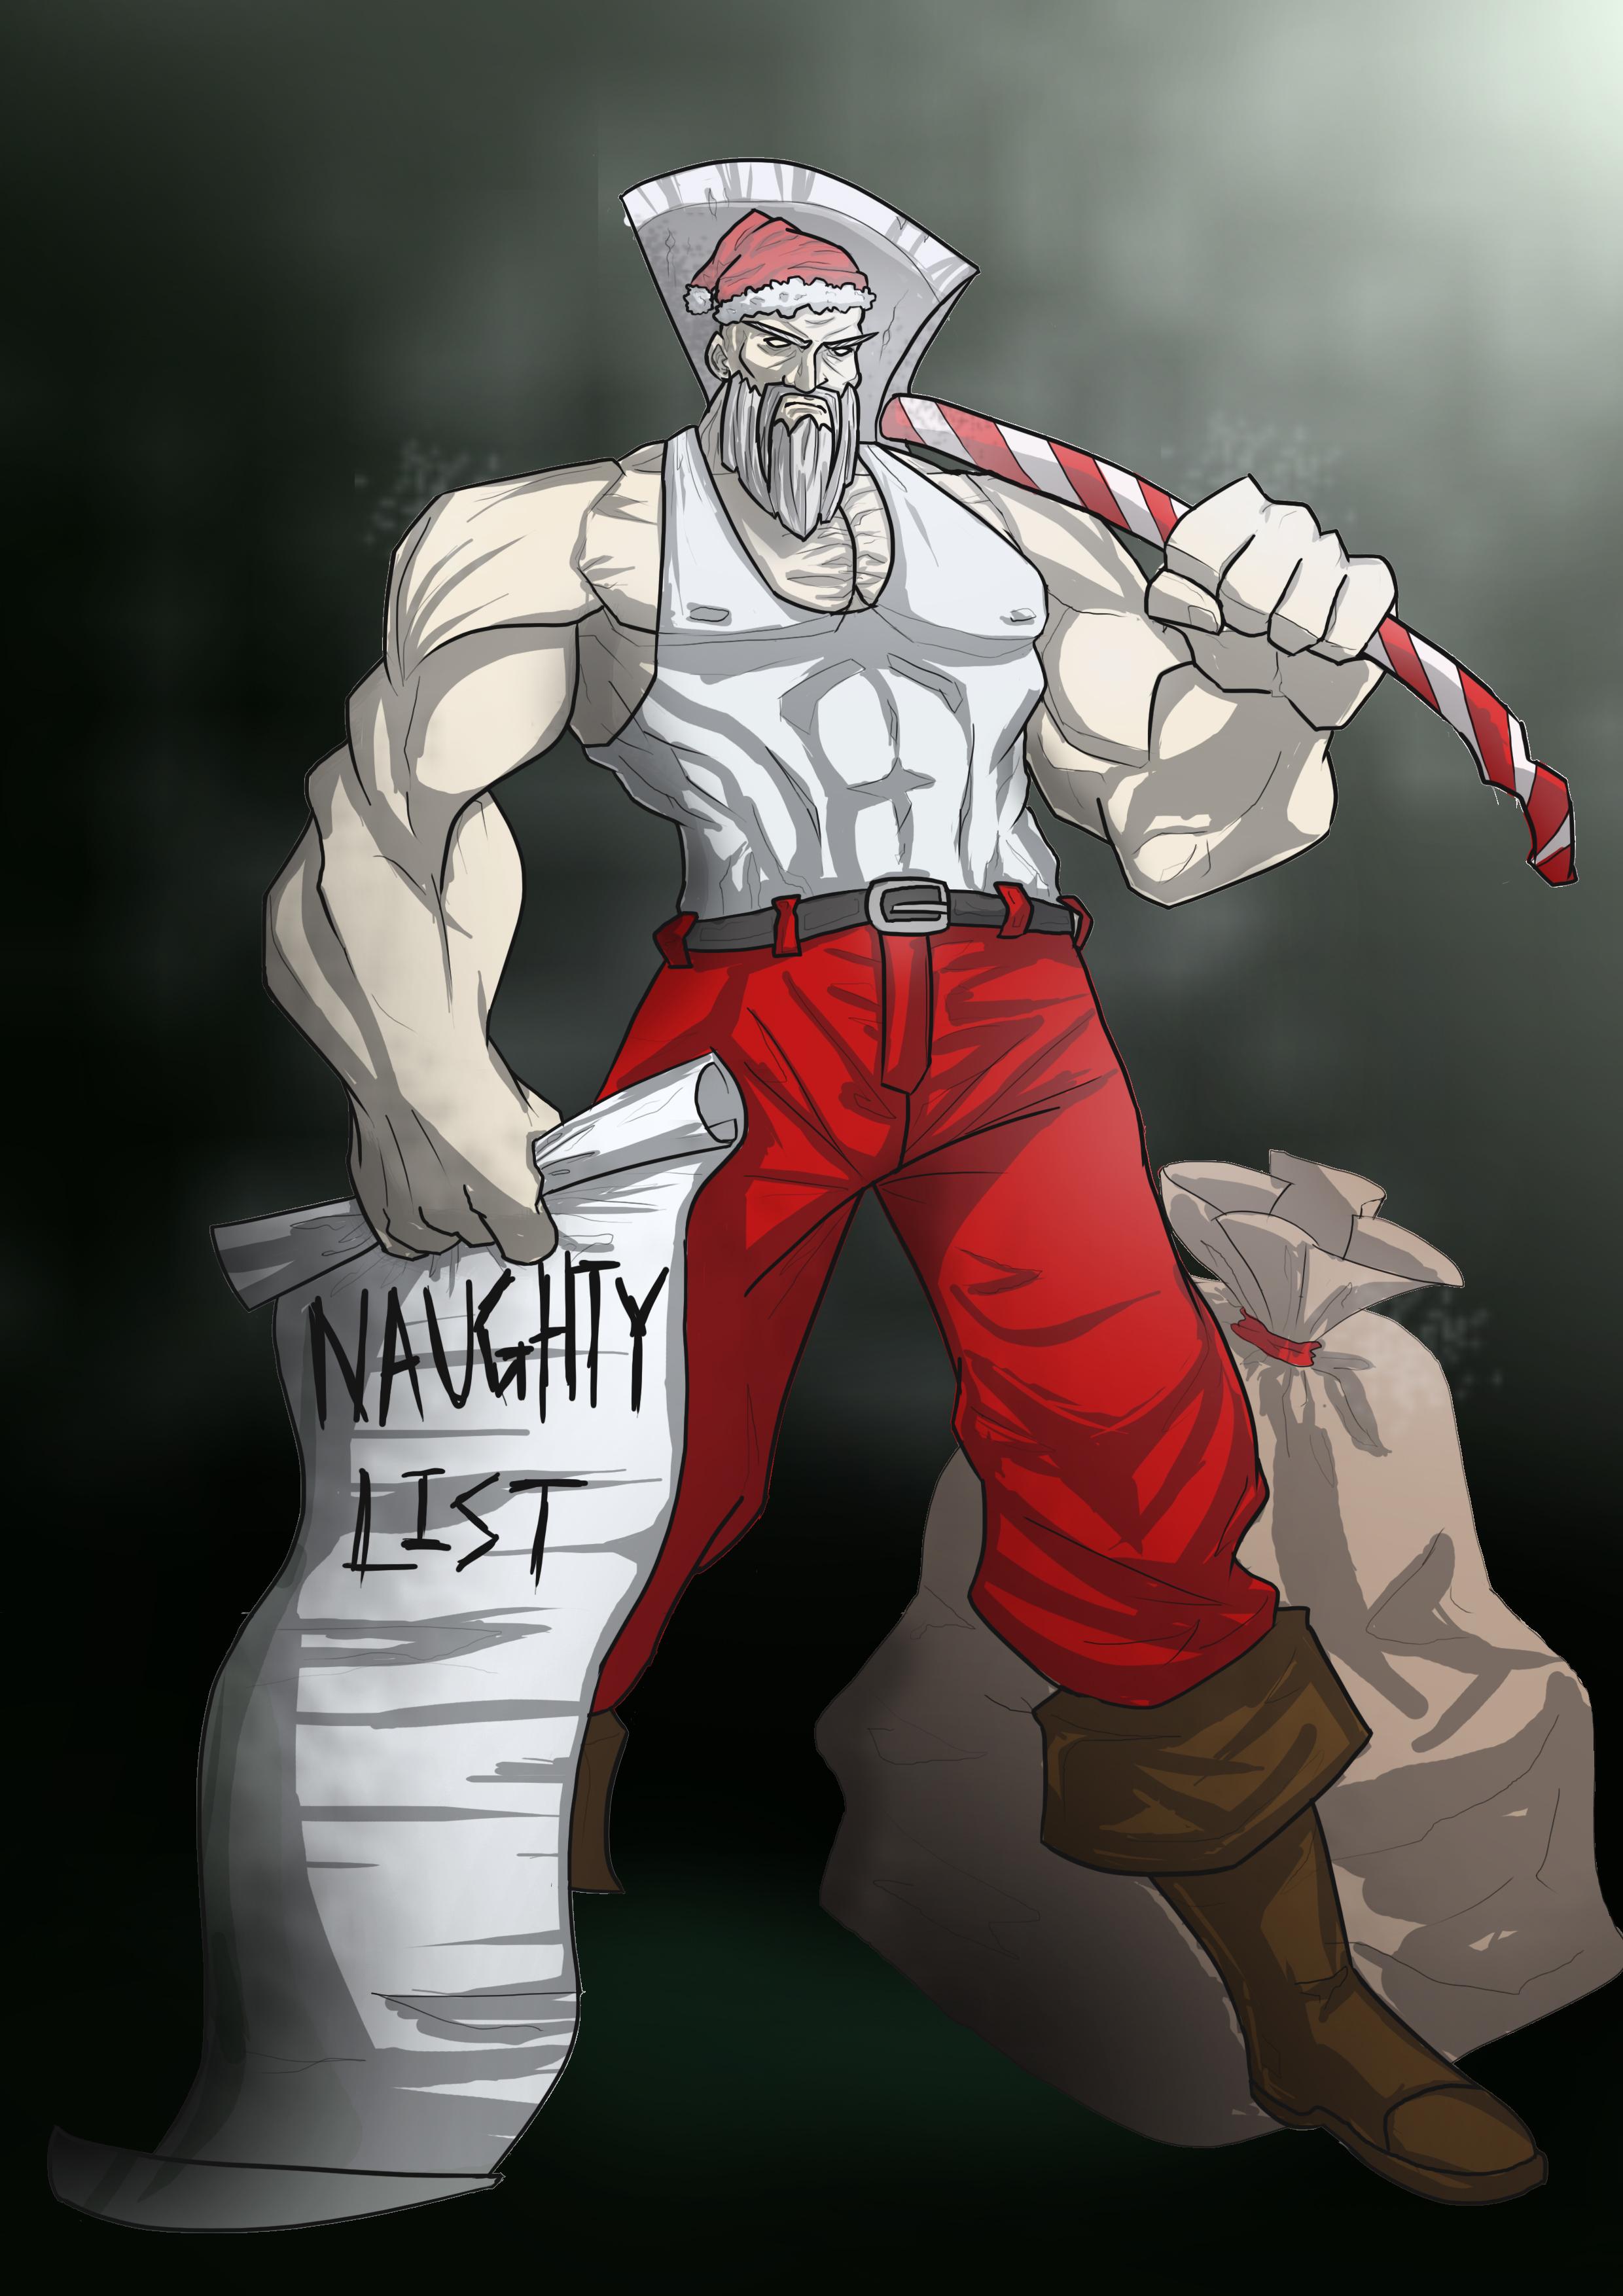 Santa the Hunter